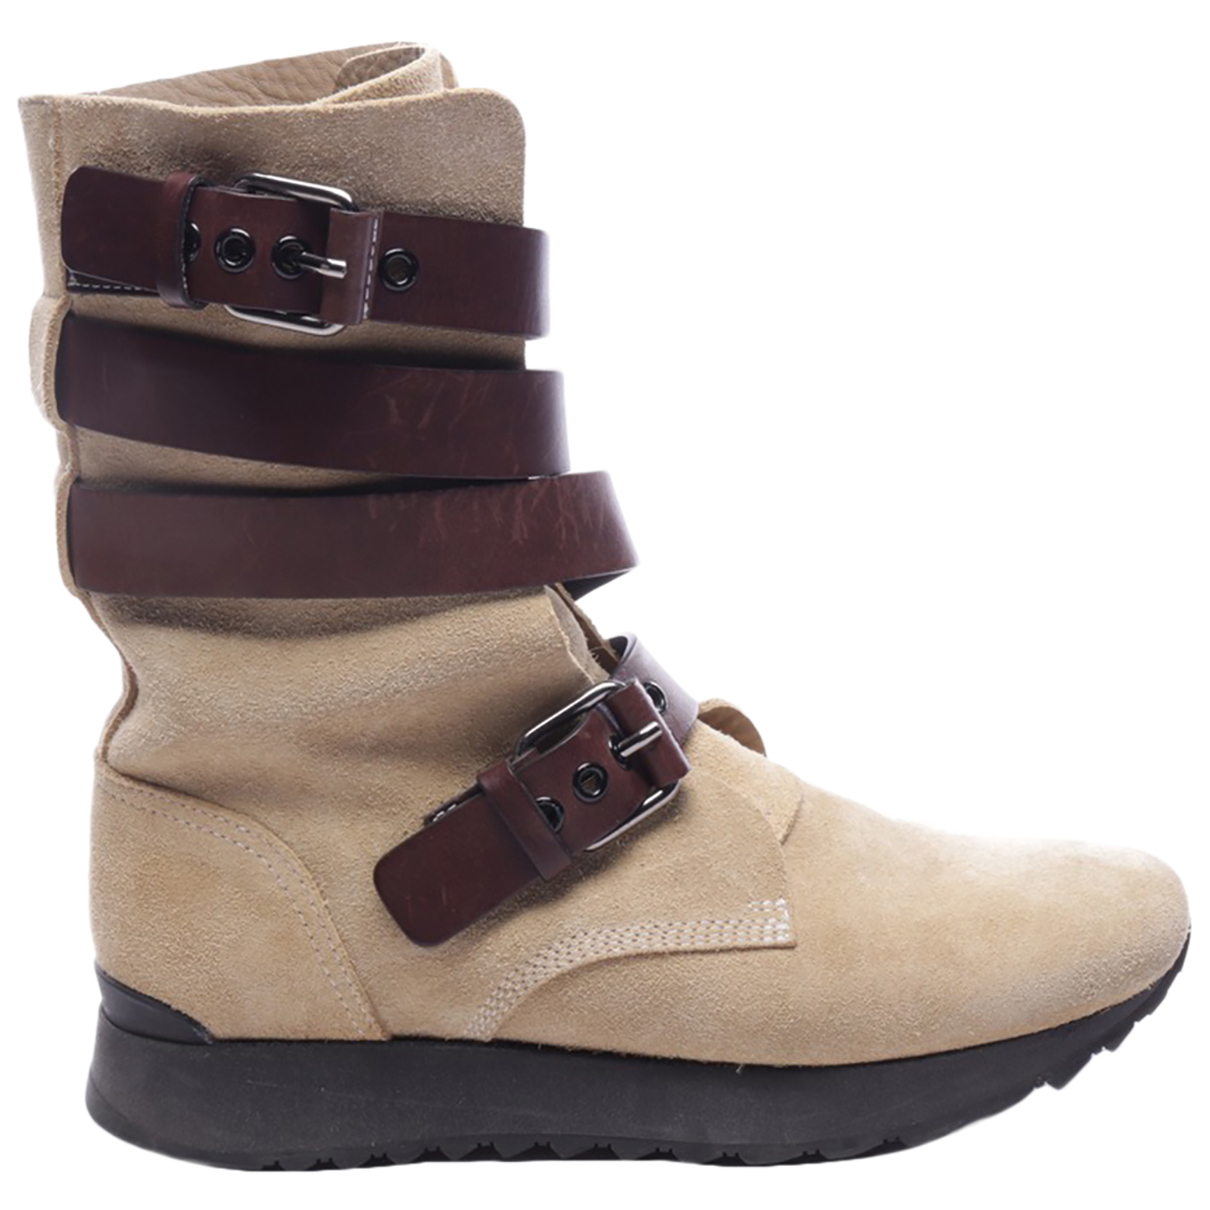 Loewe - Boots   pour femme en cuir - beige